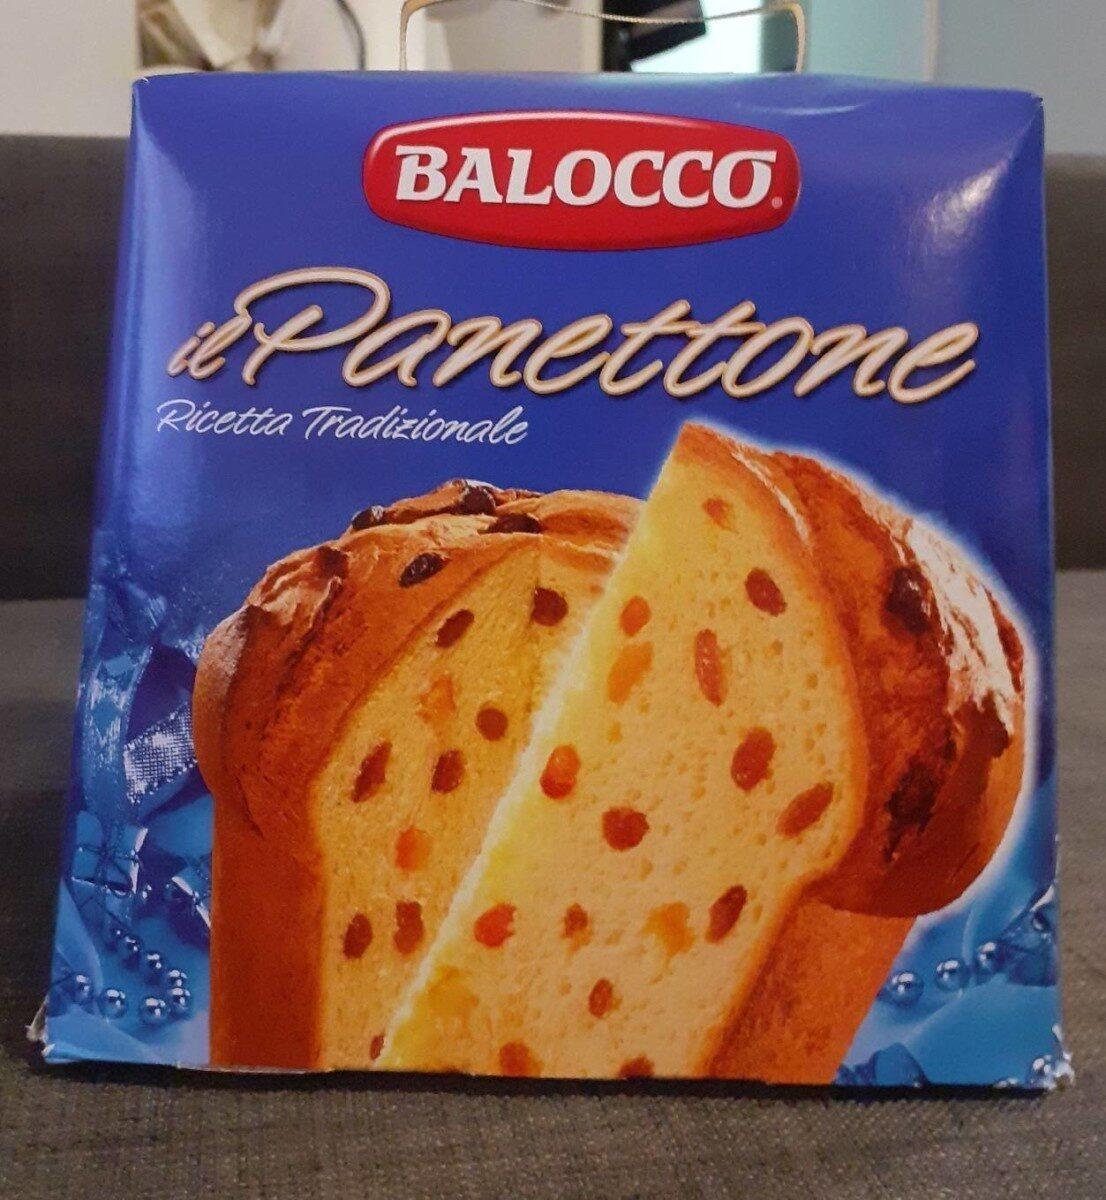 Il Panettone, ricetta tradizionale (recette traditionnelle) - Product - fr